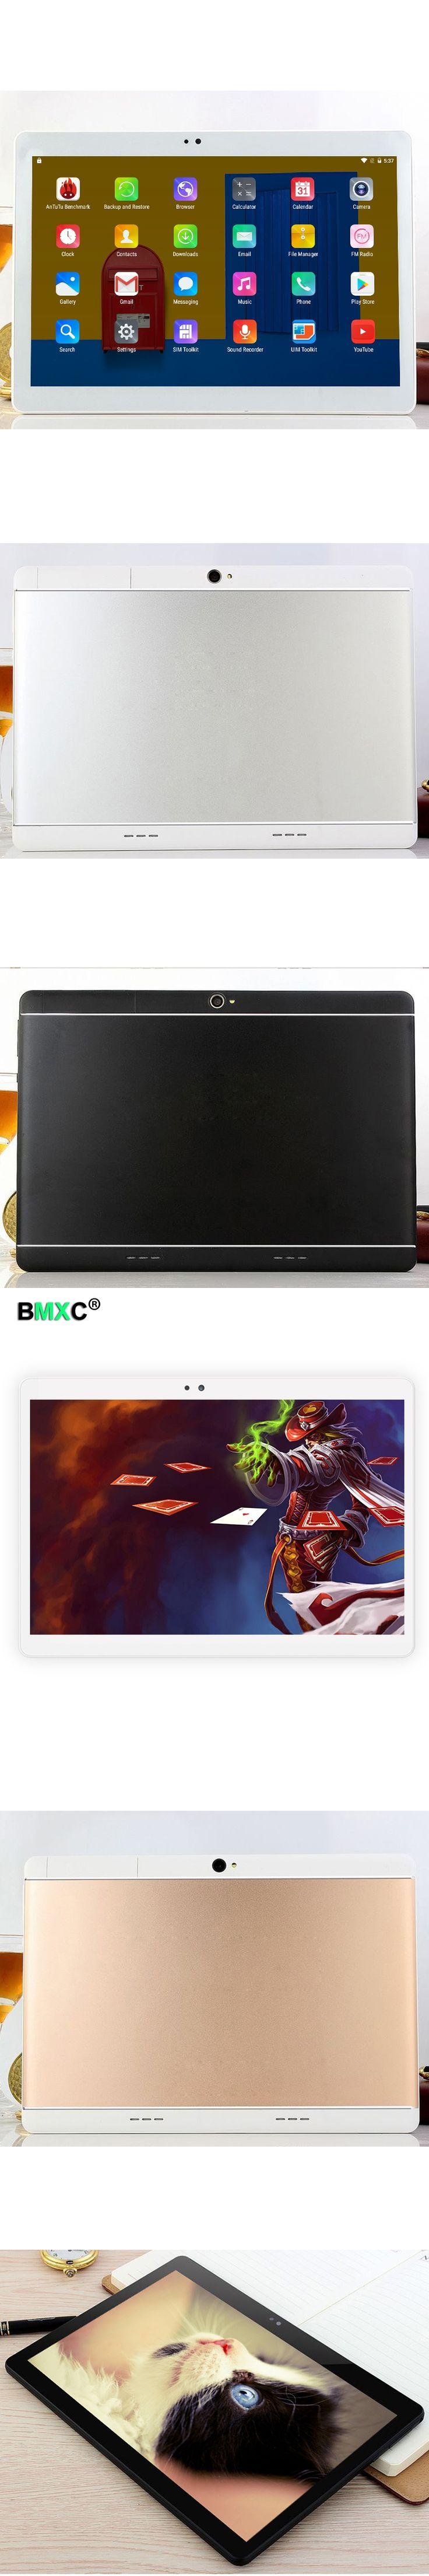 10.1 inch Octa Core 2017 Original powerful Android Tablet Pc 4GB RAM 64GB ROM IPS Dual SIM card Phone Call Tab Phone pc tablets